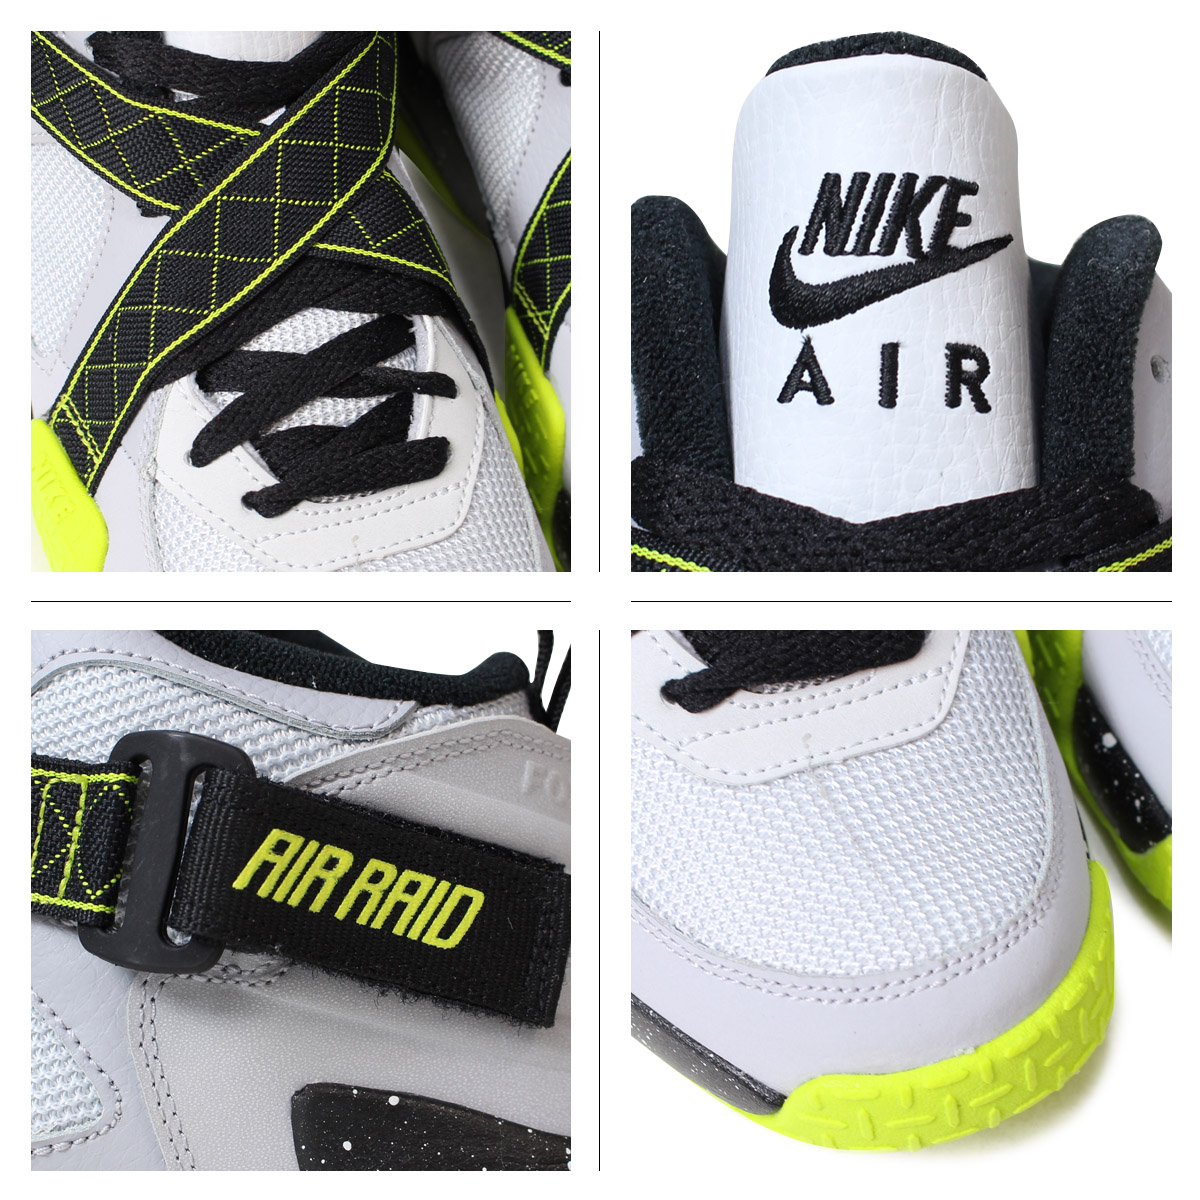 3ddb1924 [SOLD OUT] Nike NIKE Lady's AIR RAID GS sneakers air raid girls leather  mesh kids Jr. child GIRLS 644,412-002 WOLF GREY gray